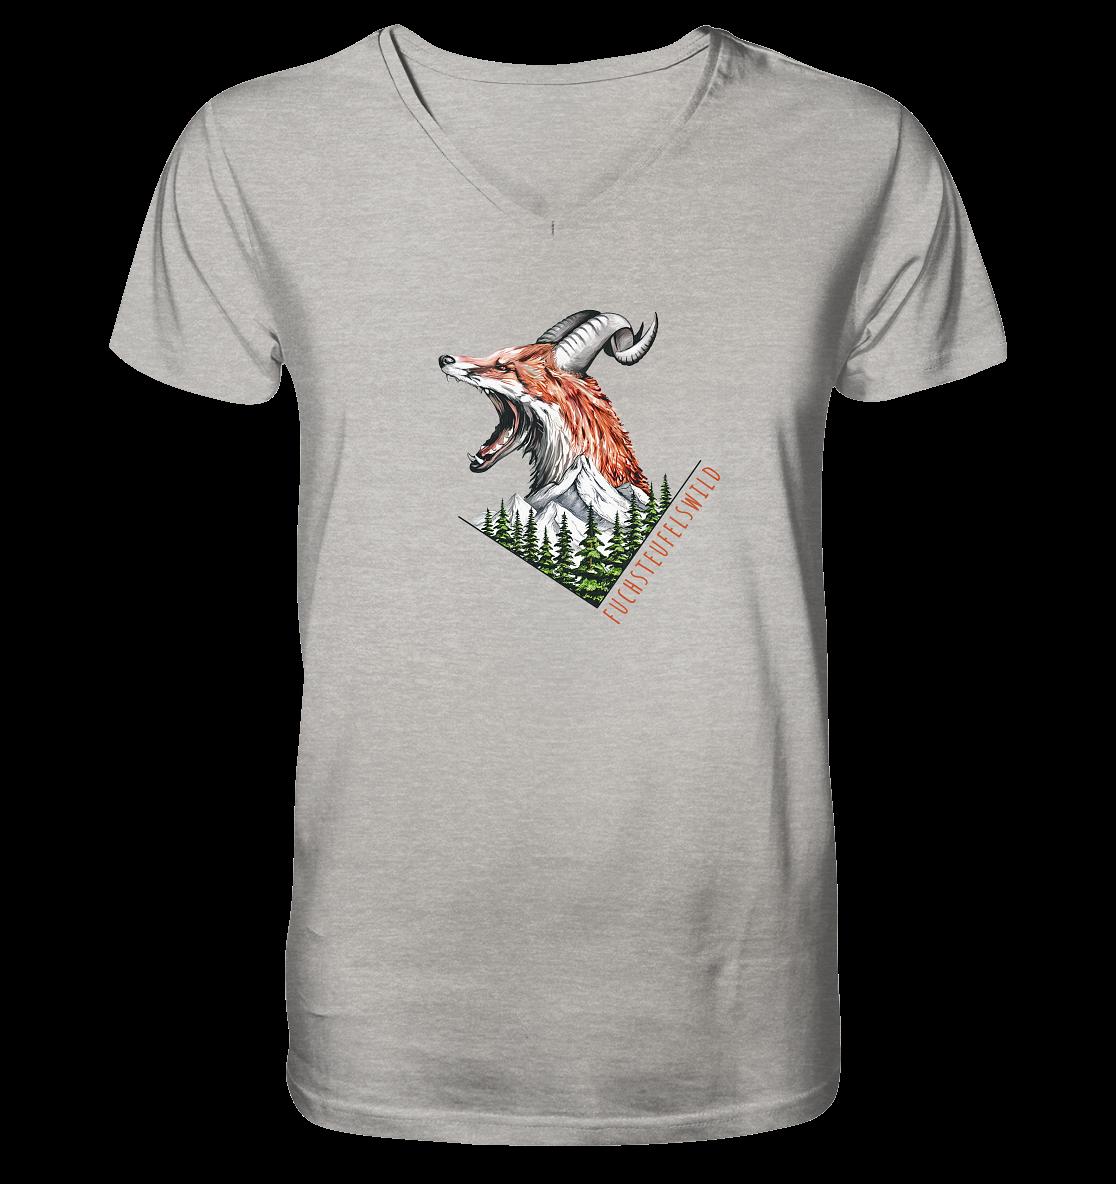 front-mens-organic-v-neck-shirt-c2c1c0-1116x-1.png